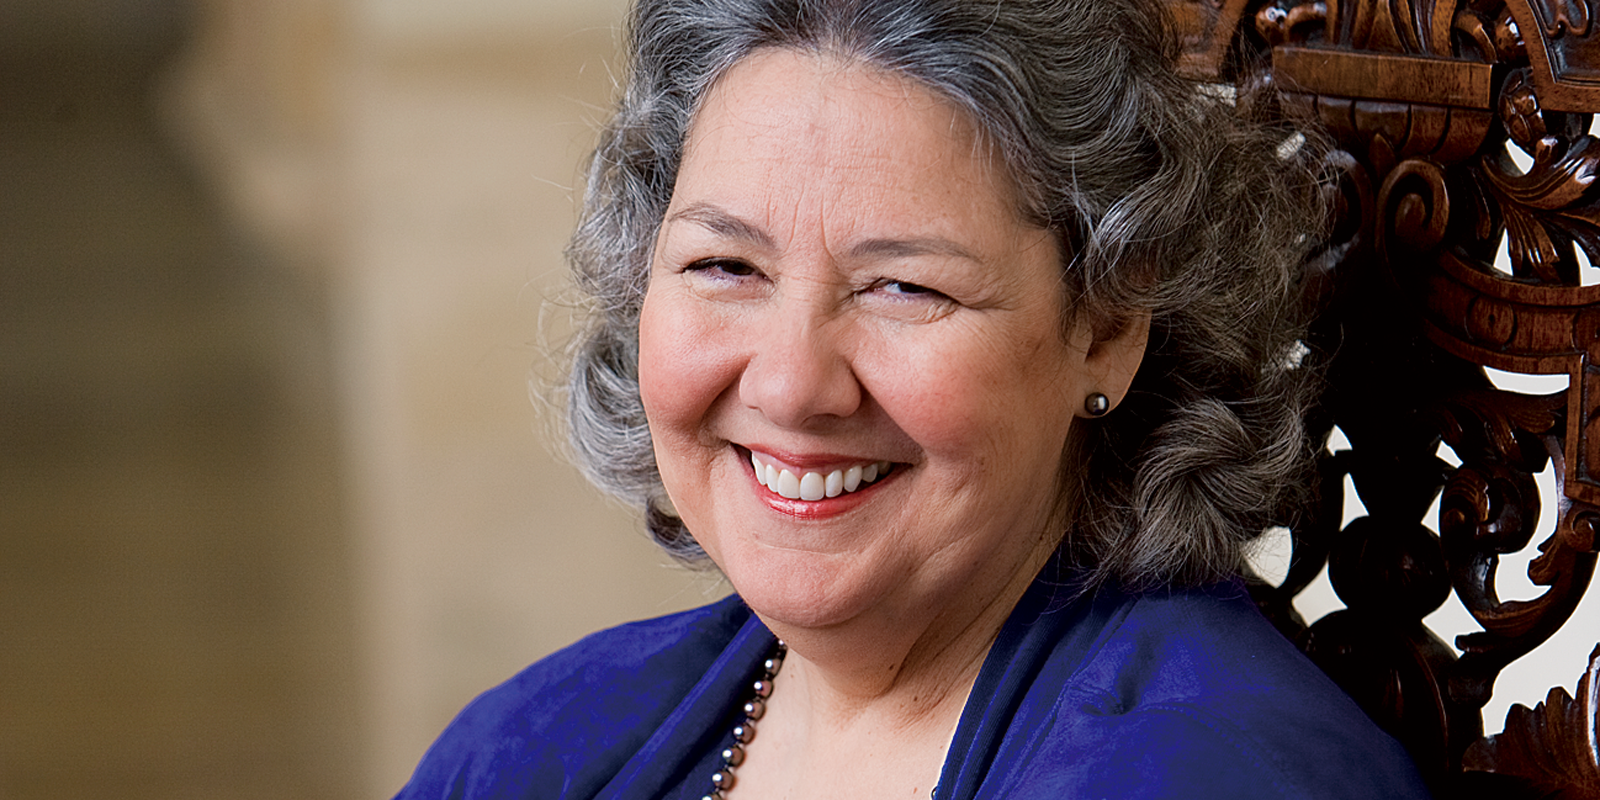 USD Board of Trustees Chair Darlene Marcos Shiley